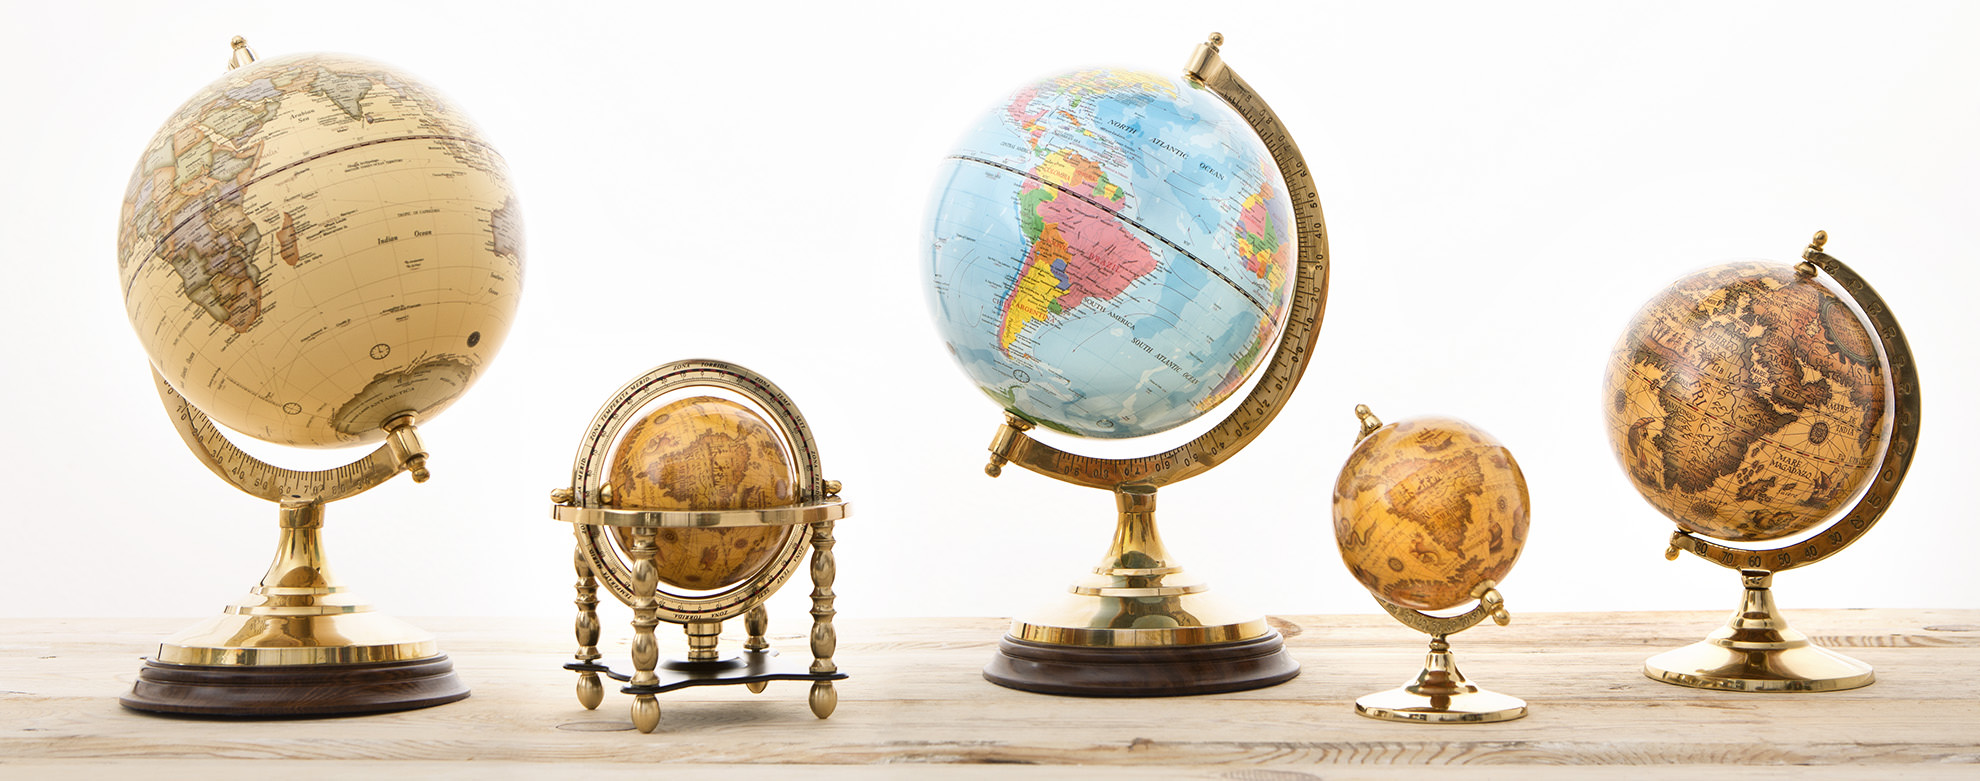 Globen, Armillarsphären